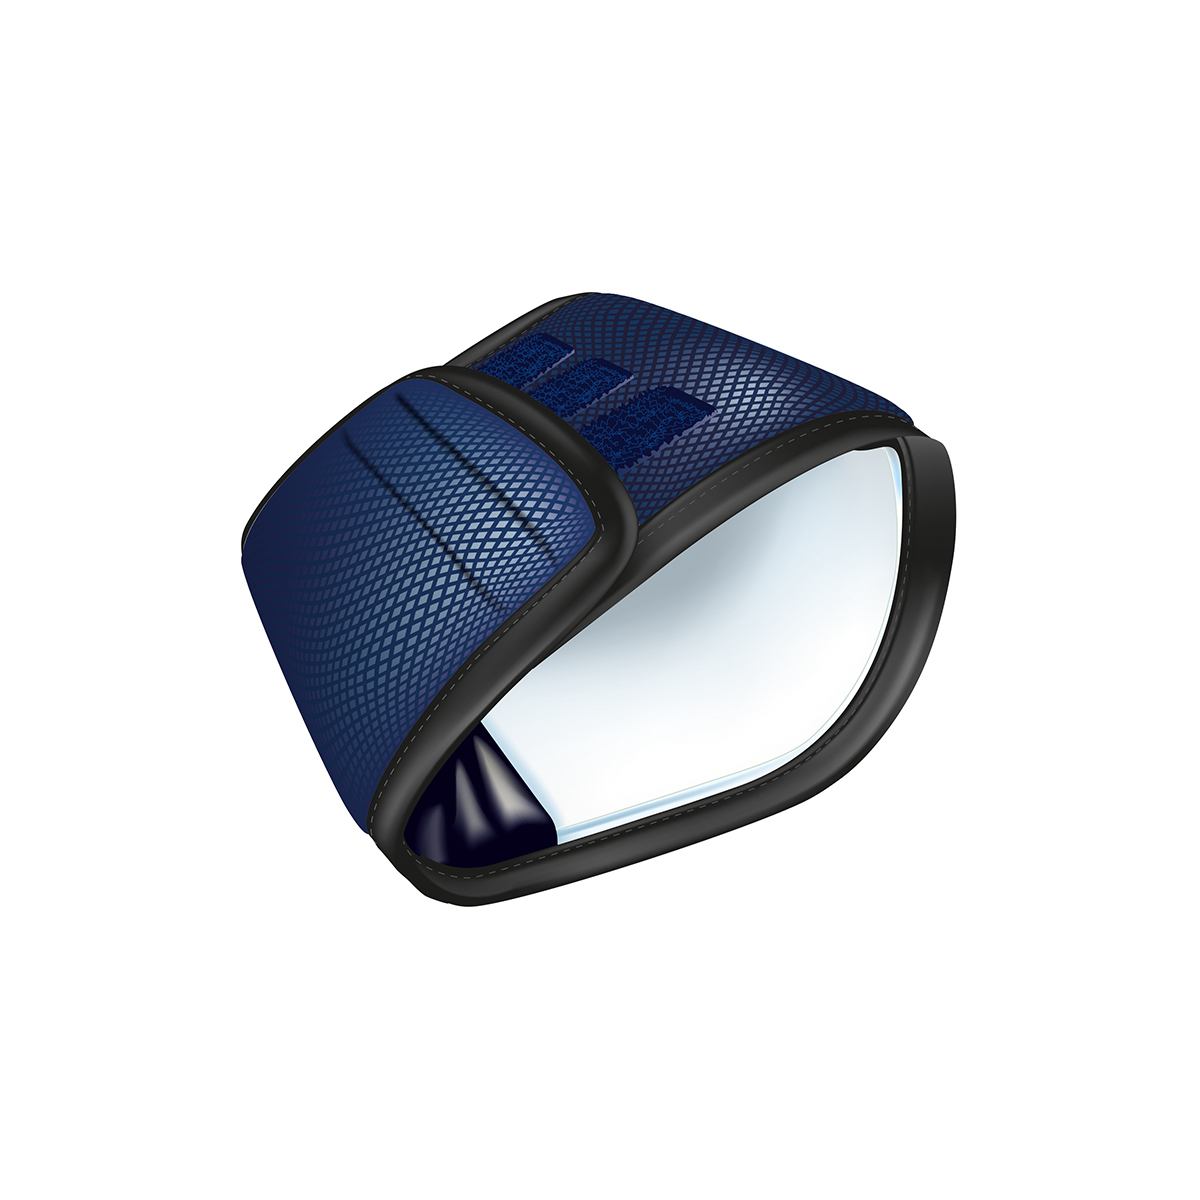 Trixie Plasband voor Reuen Donkerblauw S-M 37-45cm